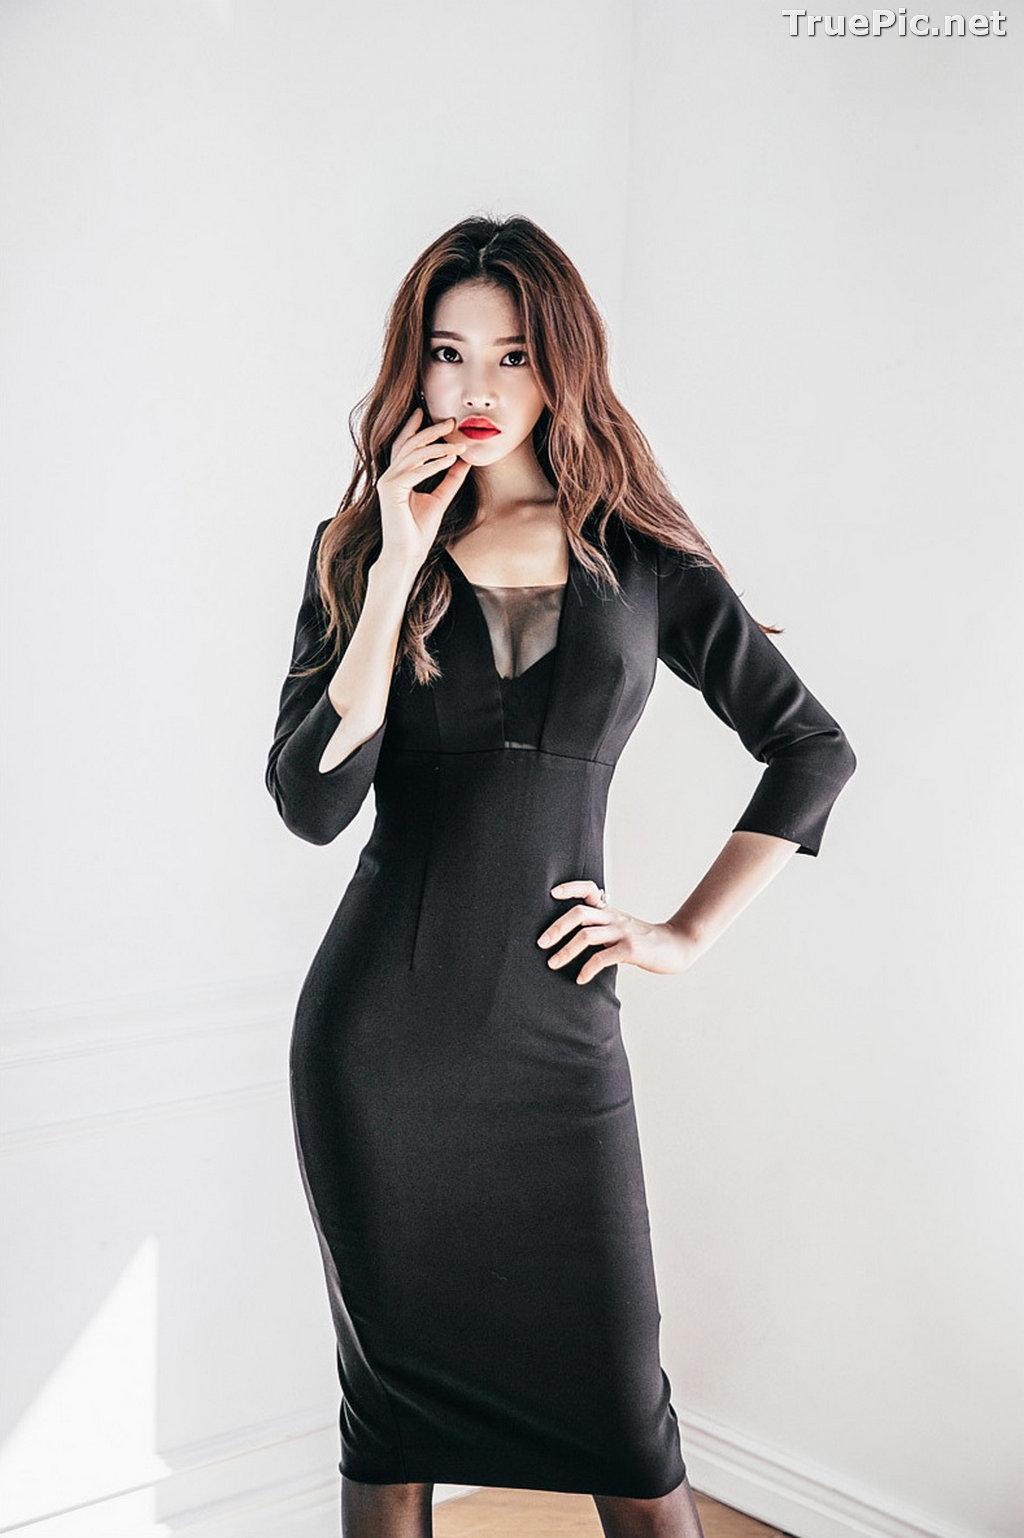 Image Korean Beautiful Model – Park Jung Yoon – Fashion Photography #4 - TruePic.net - Picture-1